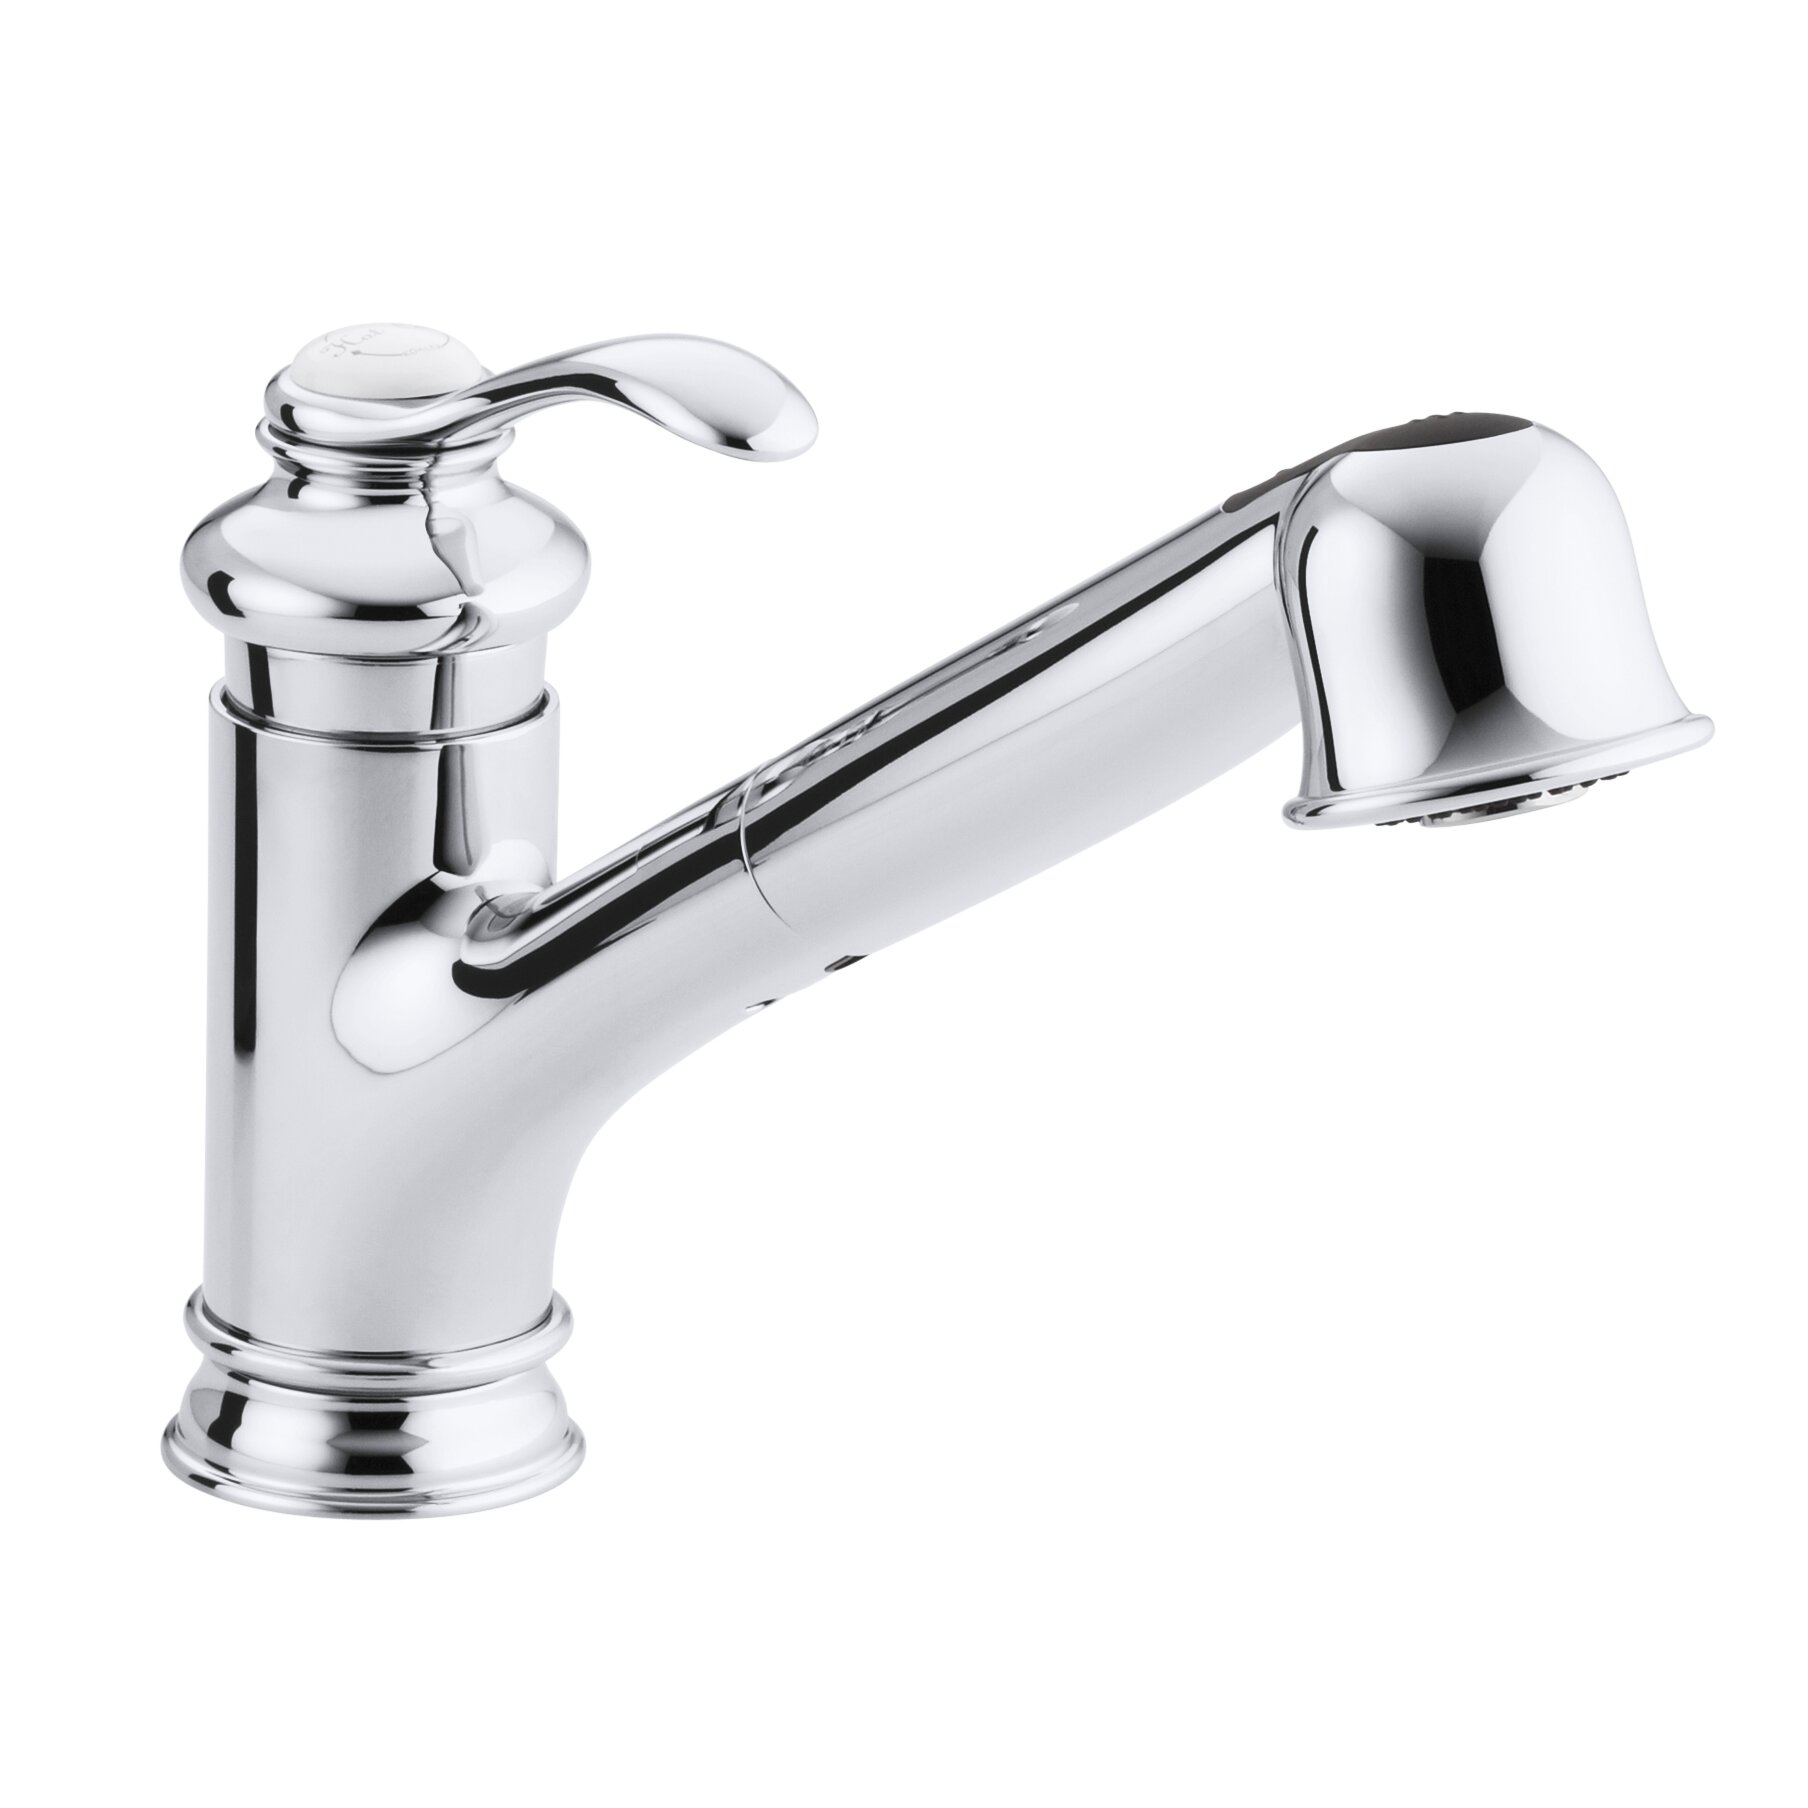 design 15001500 single hole kitchen faucet withrow singlehole kohler fairfax singlehole or threehole kitchen sink faucet with single hole kitchen faucet